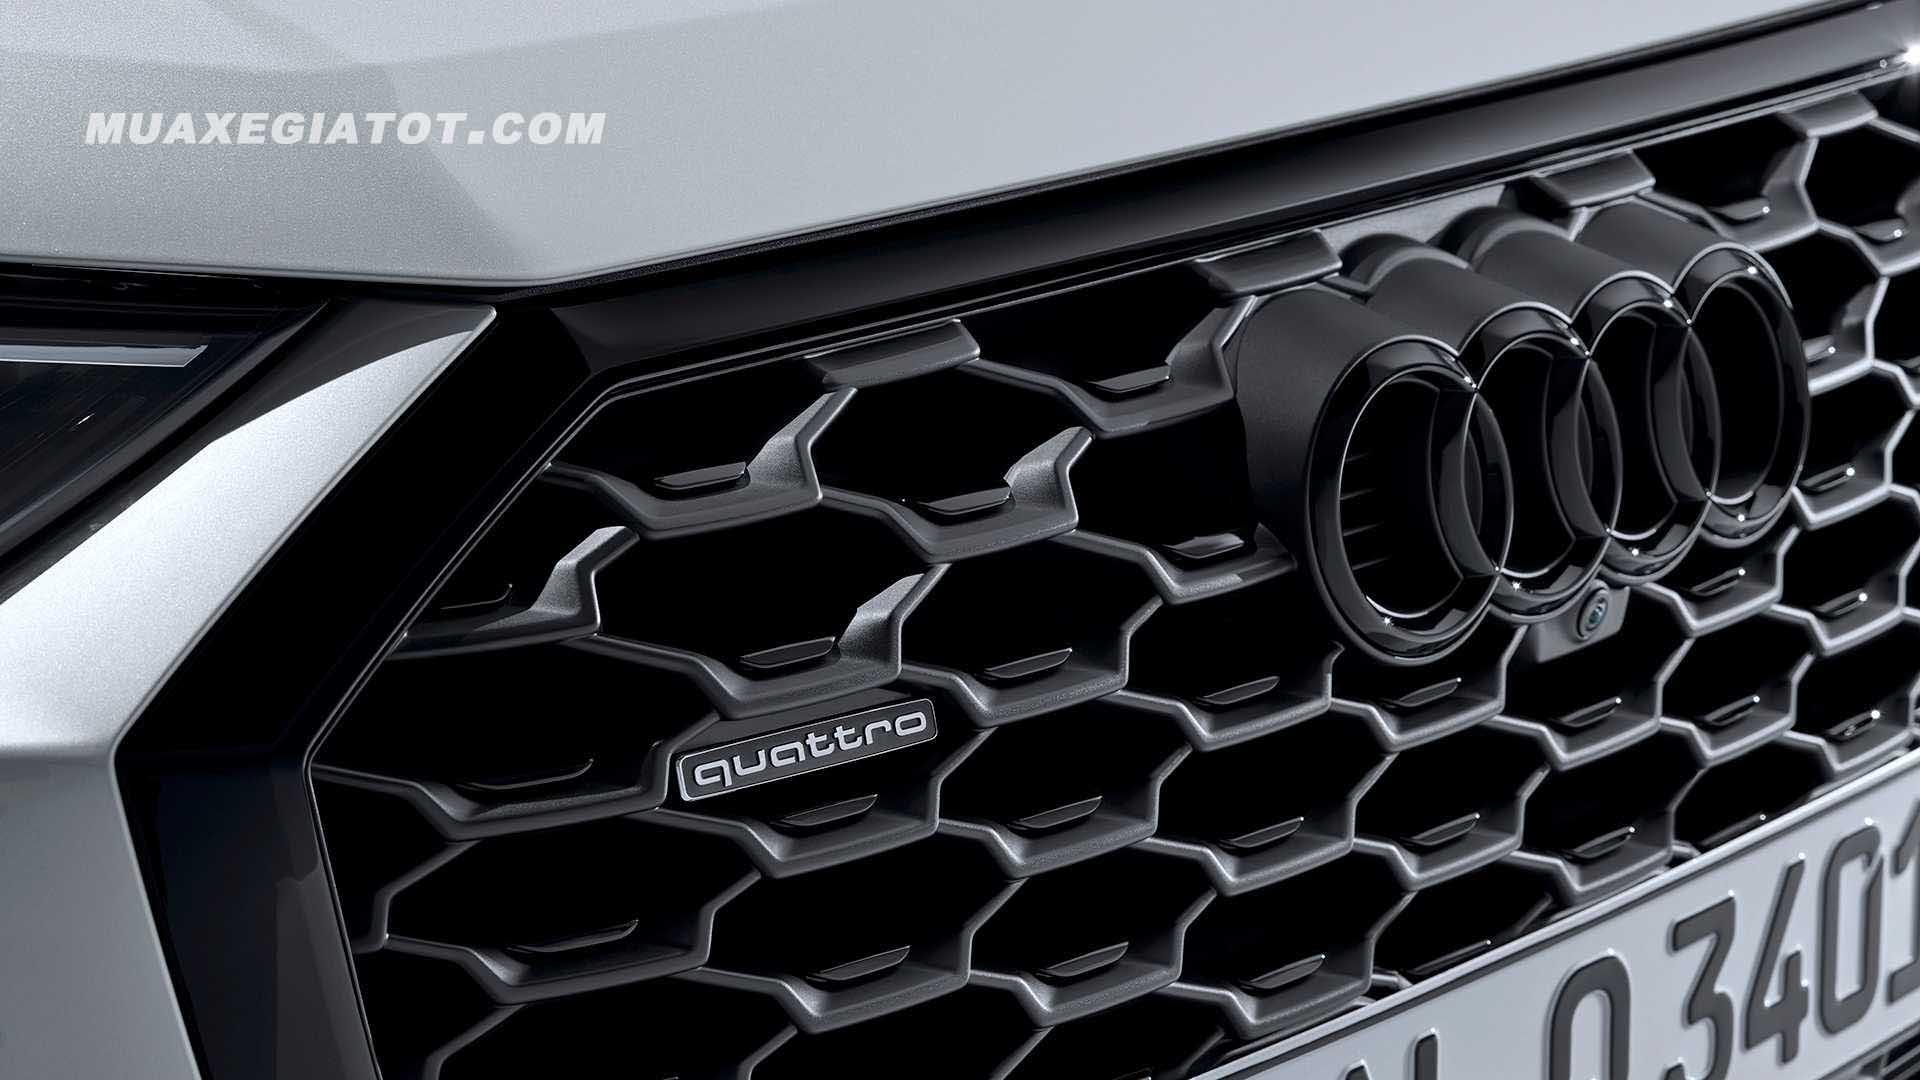 luoi-tan-nhiet-xe-audi-q3-sportback-2020-muaxegiatot-com